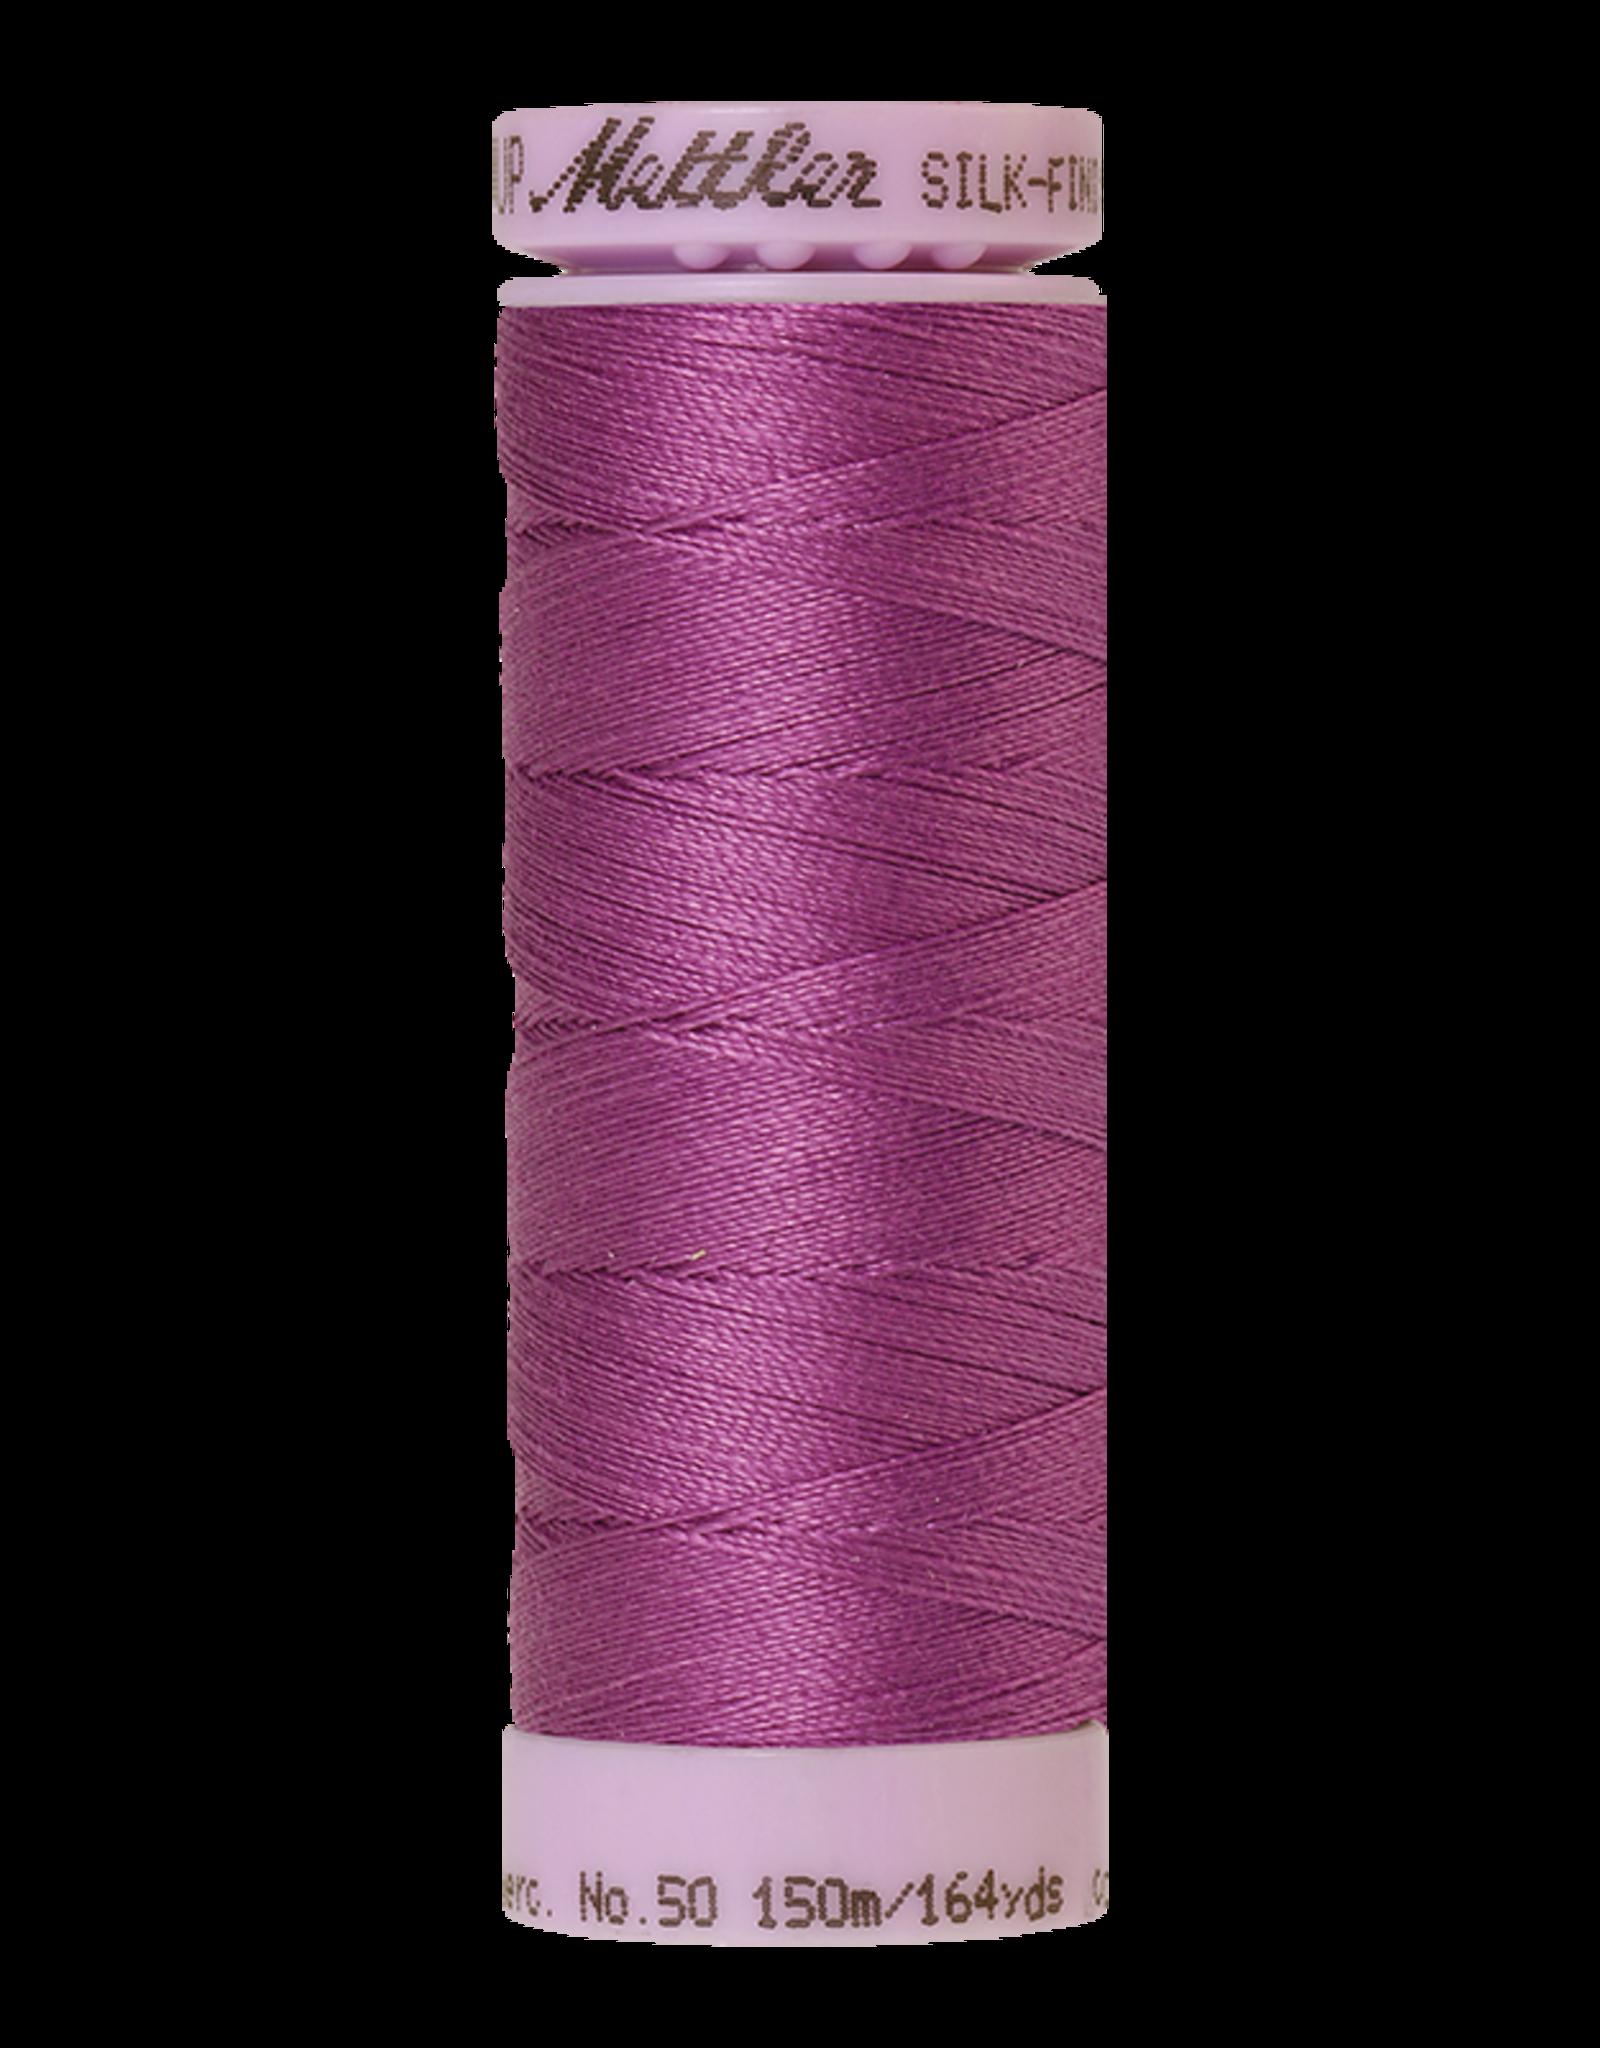 Mettler Silk Finish Cotton 50 - 150 meter - 1061